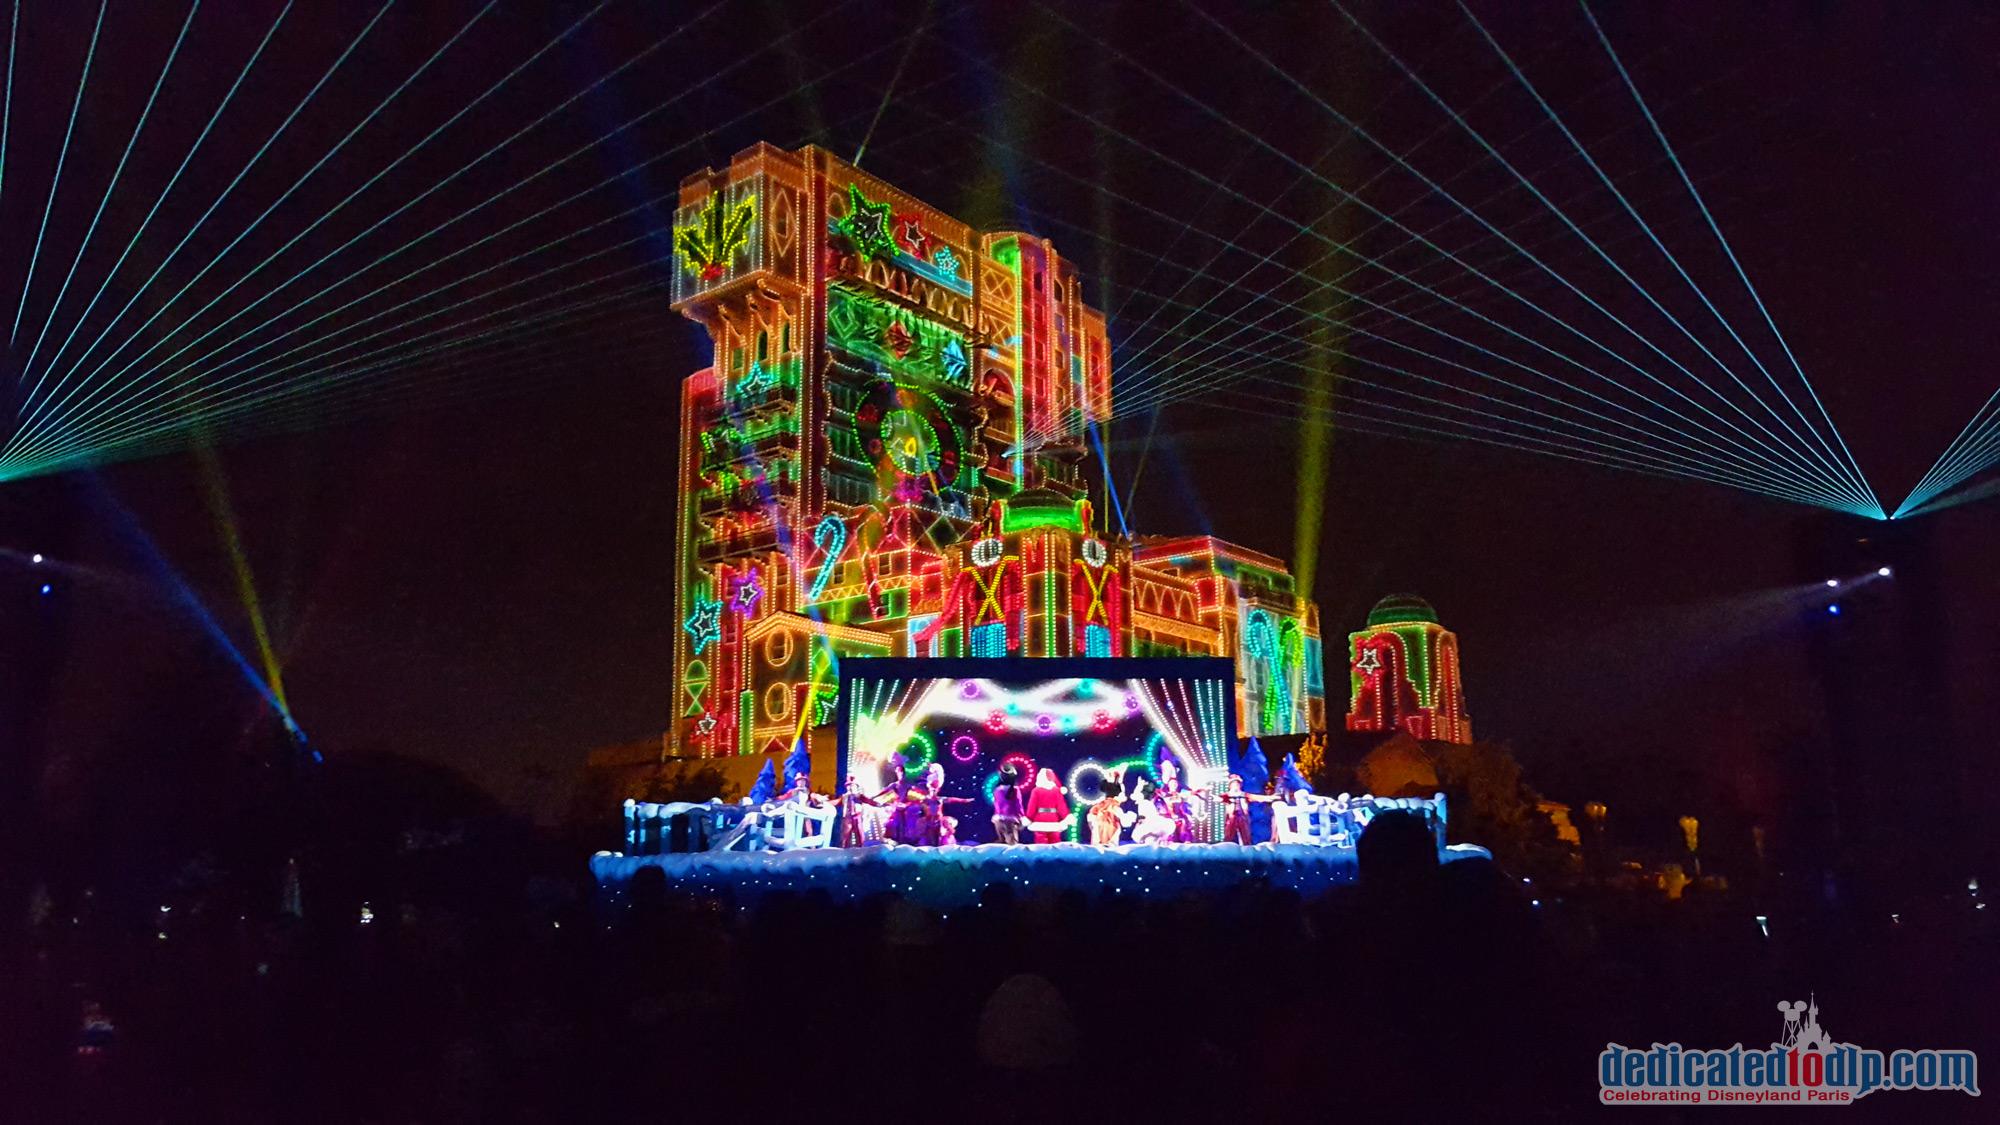 Dedicated to dlp celebrating disneyland paris disneyland paris review christmas 2017 - Disneyland paris noel 2017 ...